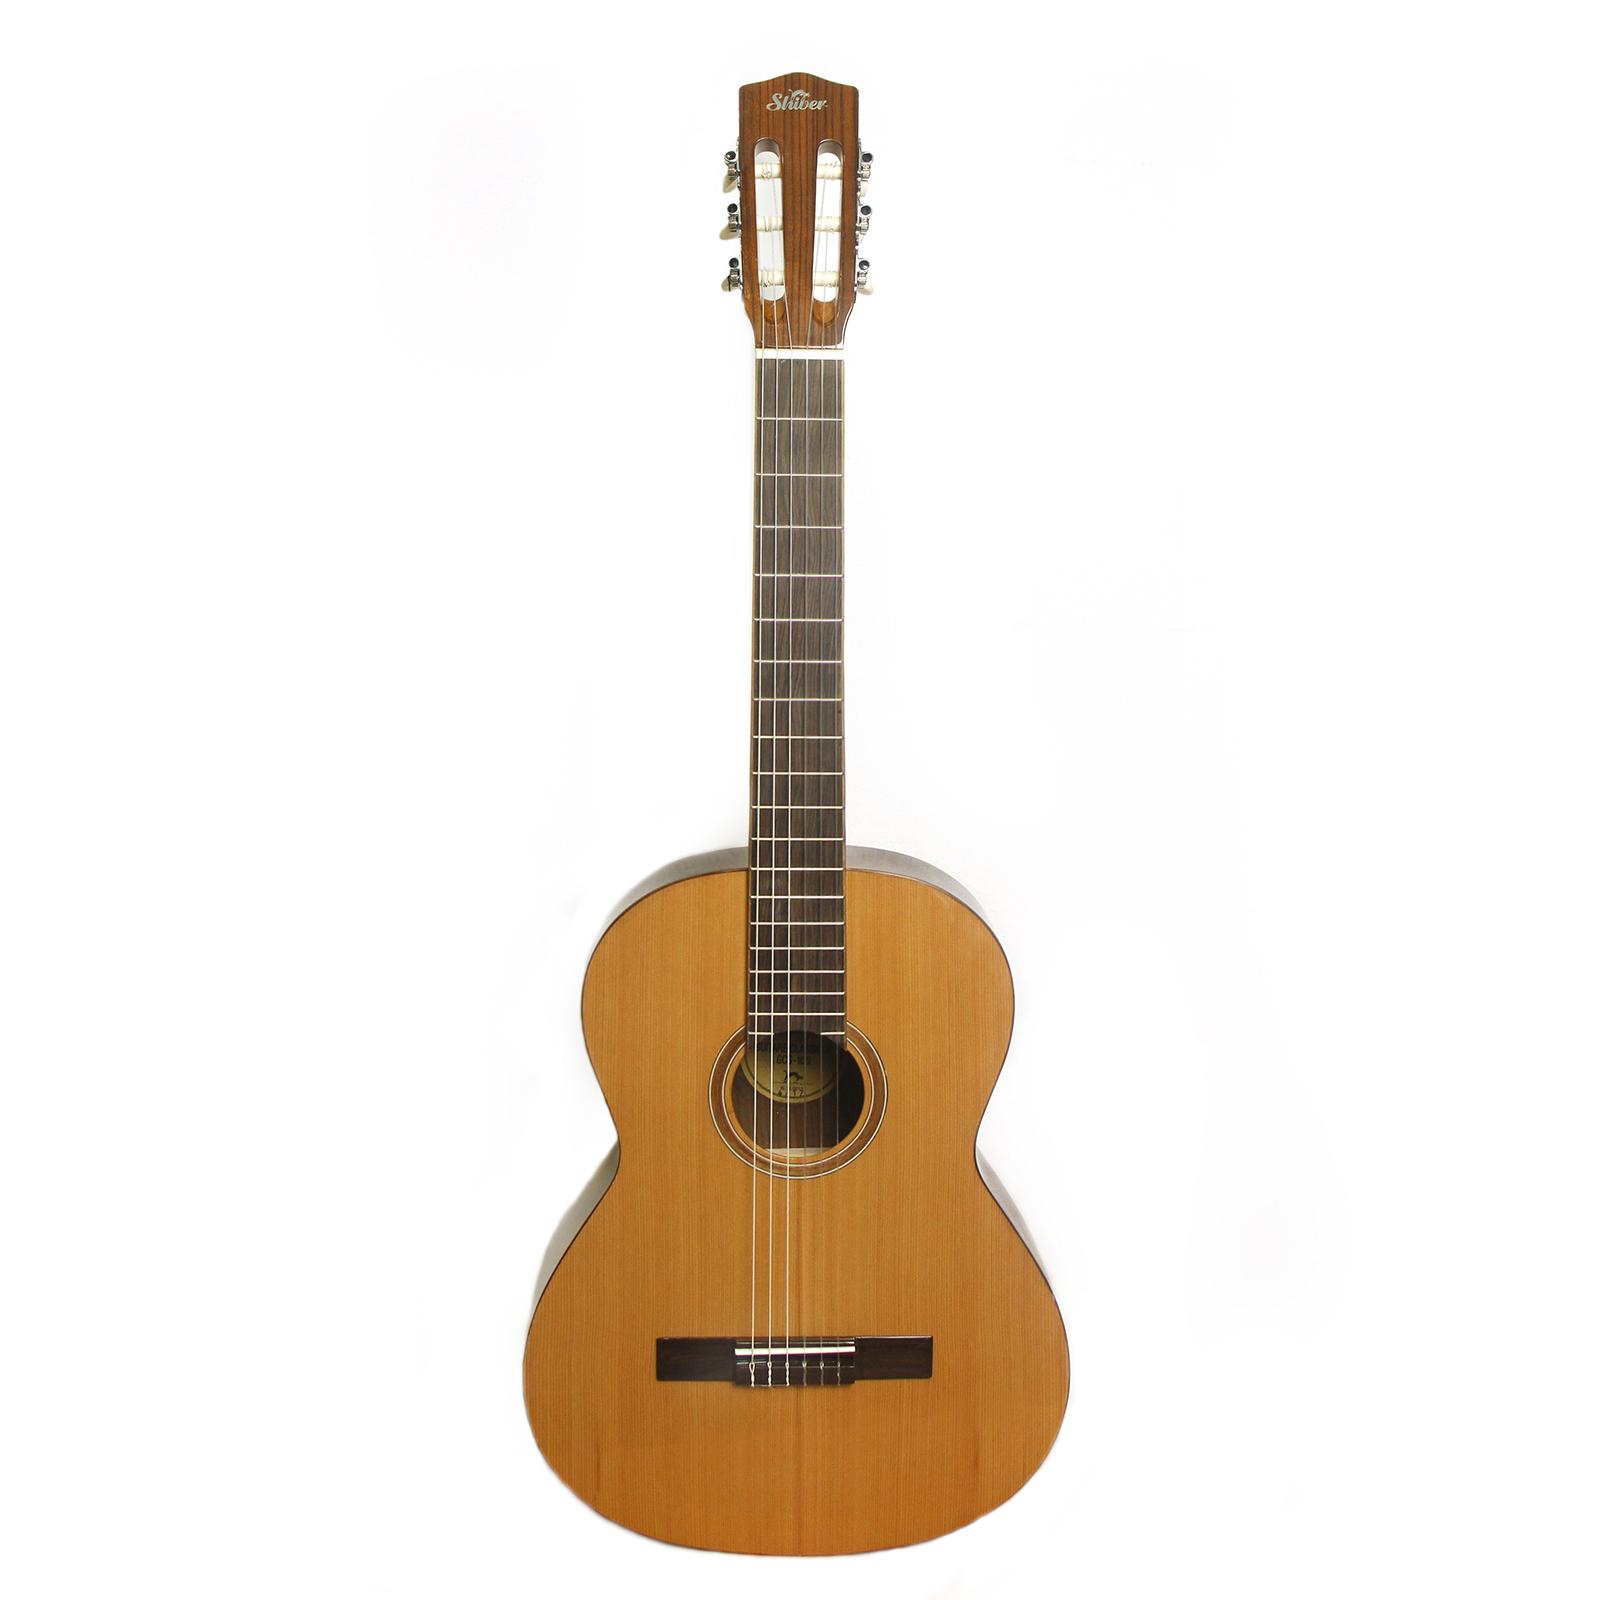 Shiver - GCS-101 guitare classique Naturelle